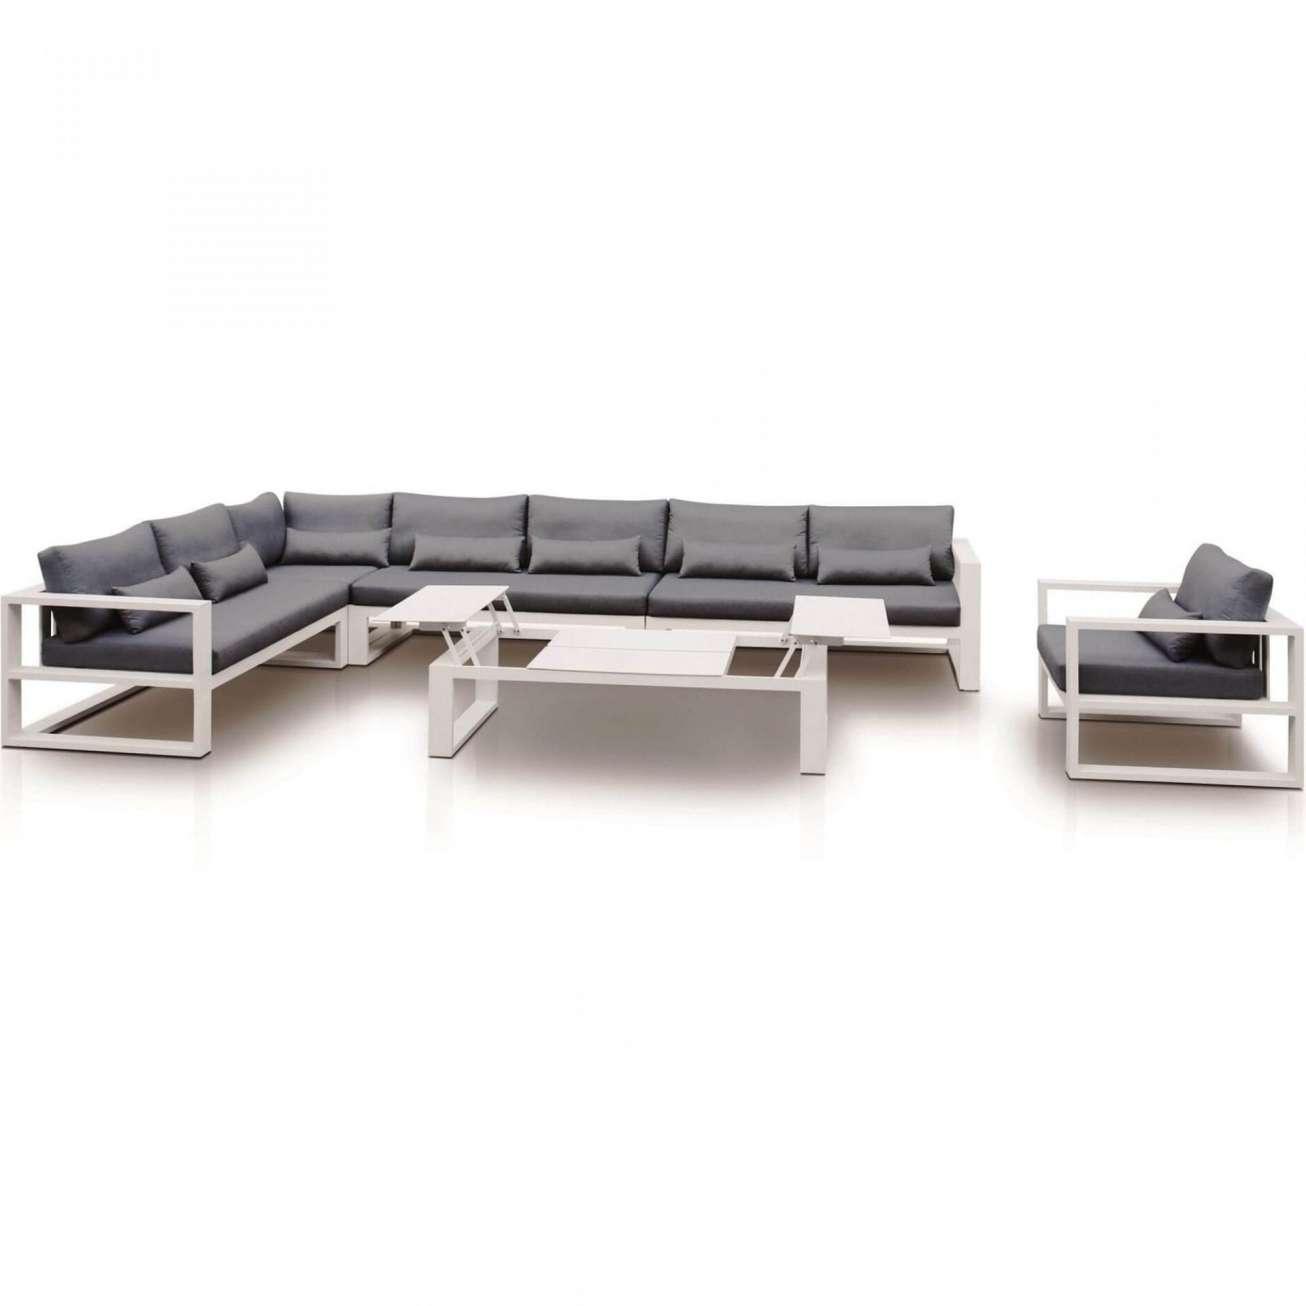 Gardenart sofagruppe med bord